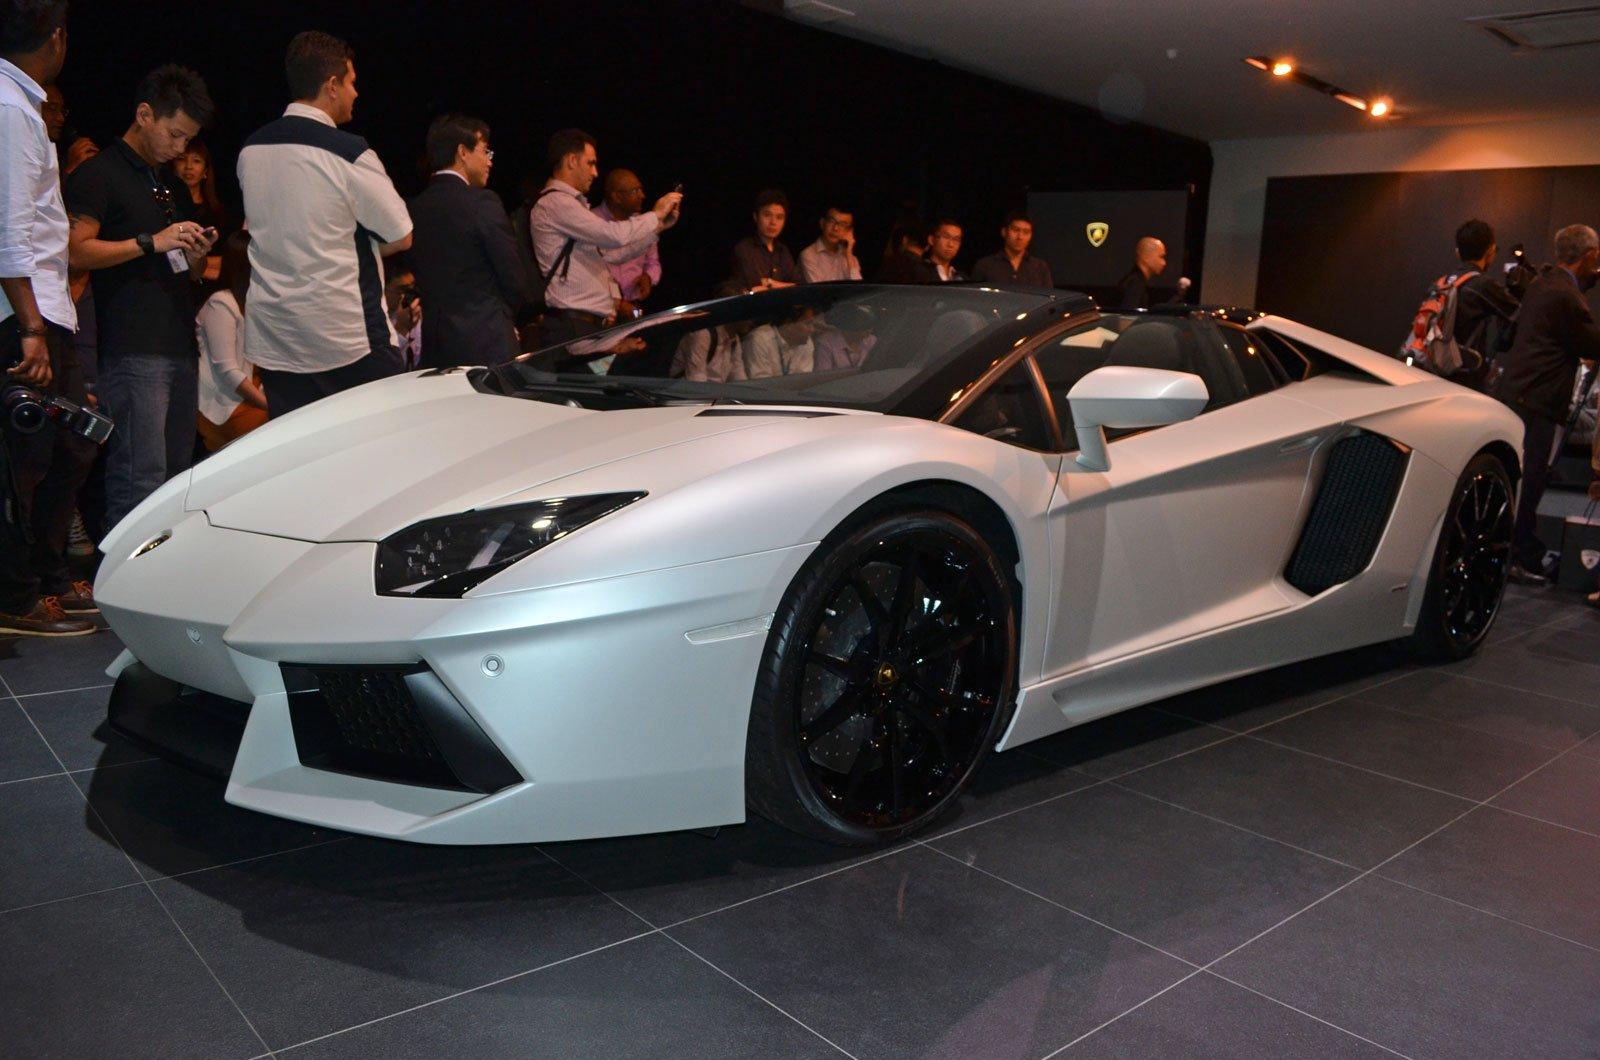 aventador roadster white as well lamborghini aventador roadster white - Lamborghini Aventador Roadster White